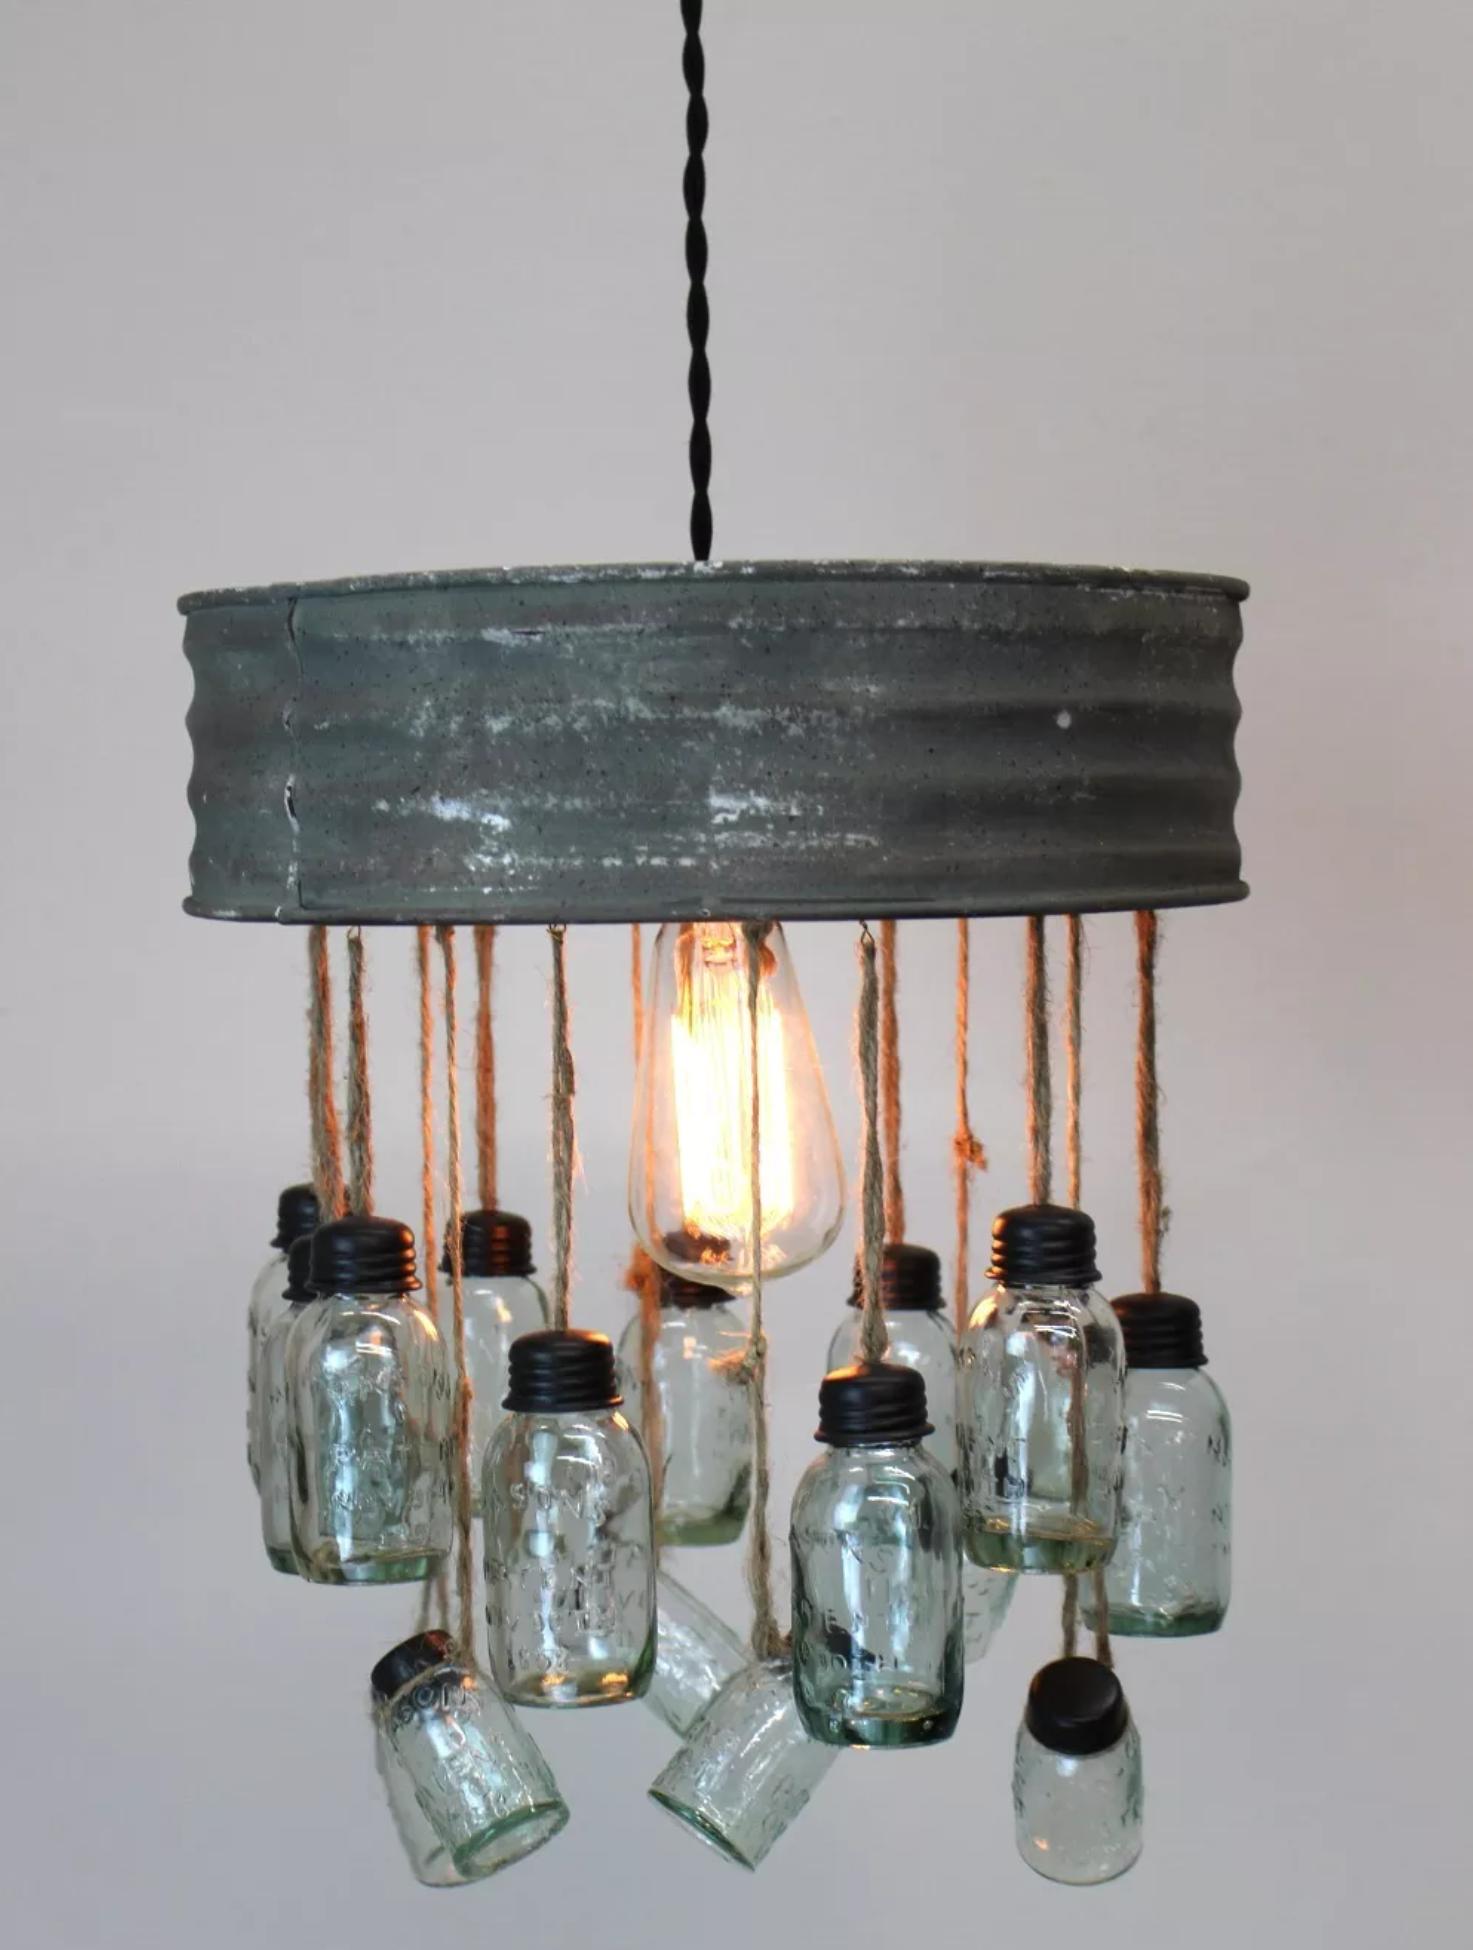 Rustic Style Mason Jar Chandelier